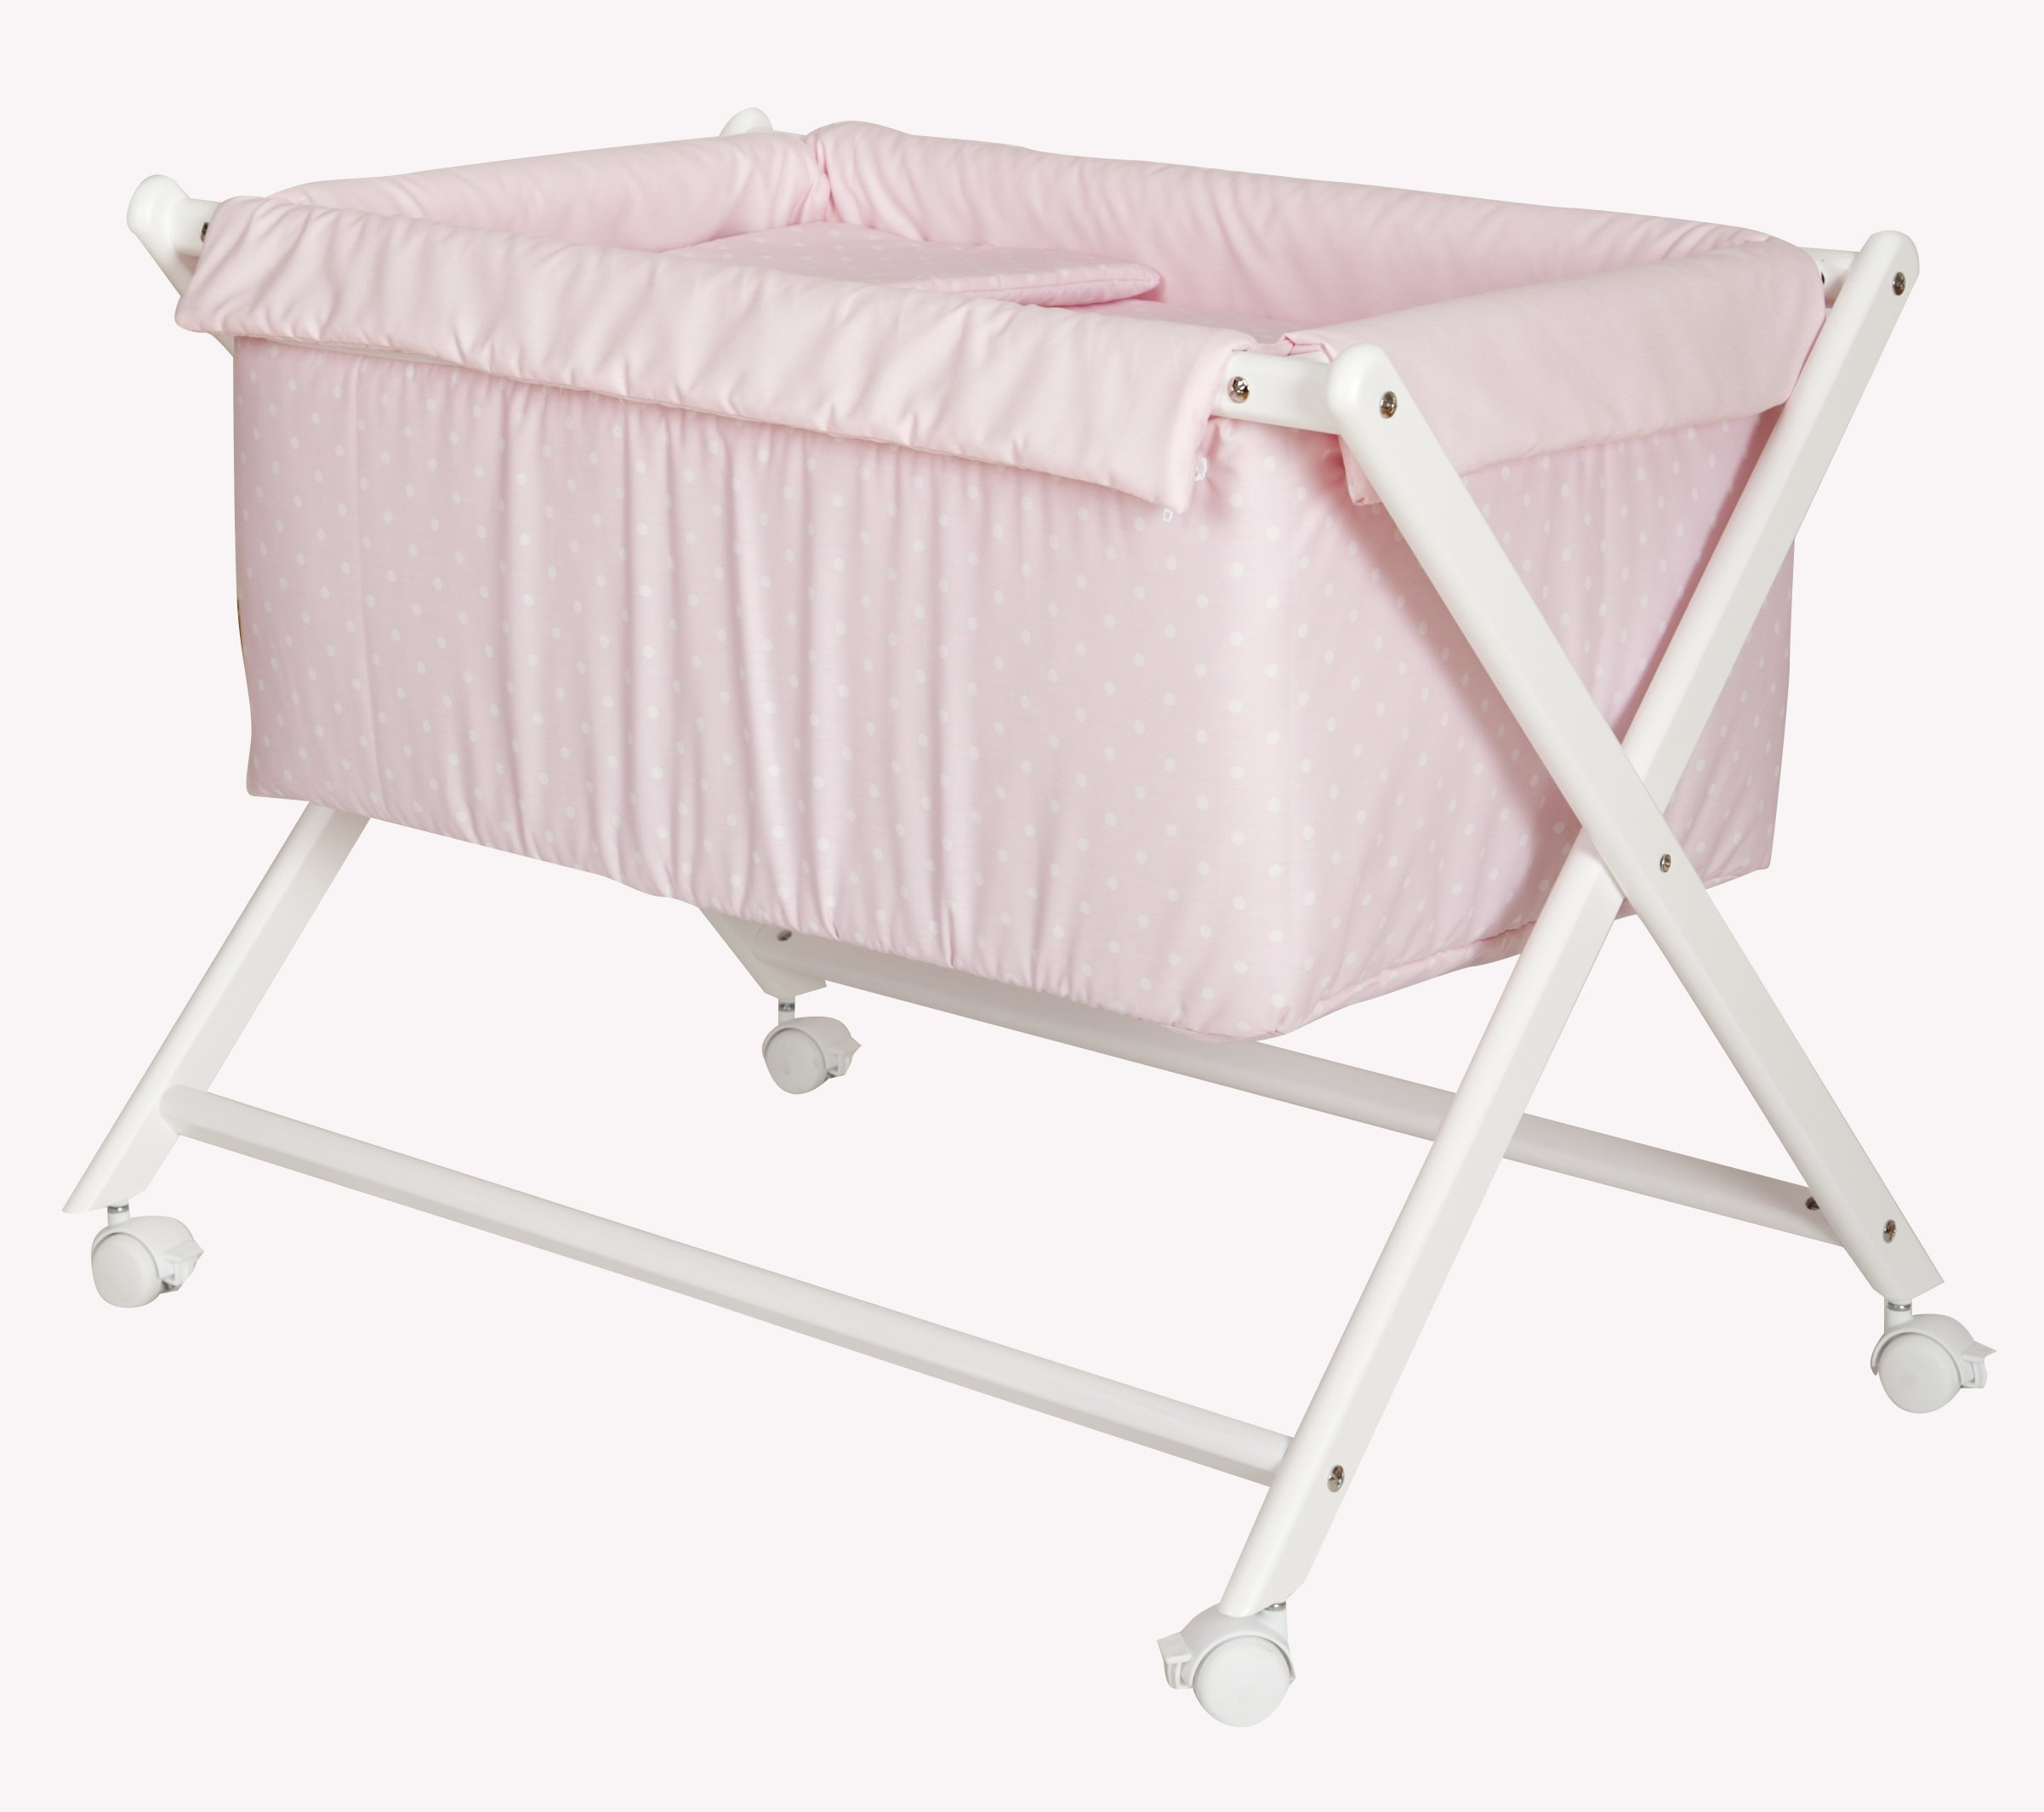 Baby Complete Mini Crib, Anti-Choking Mattress   1